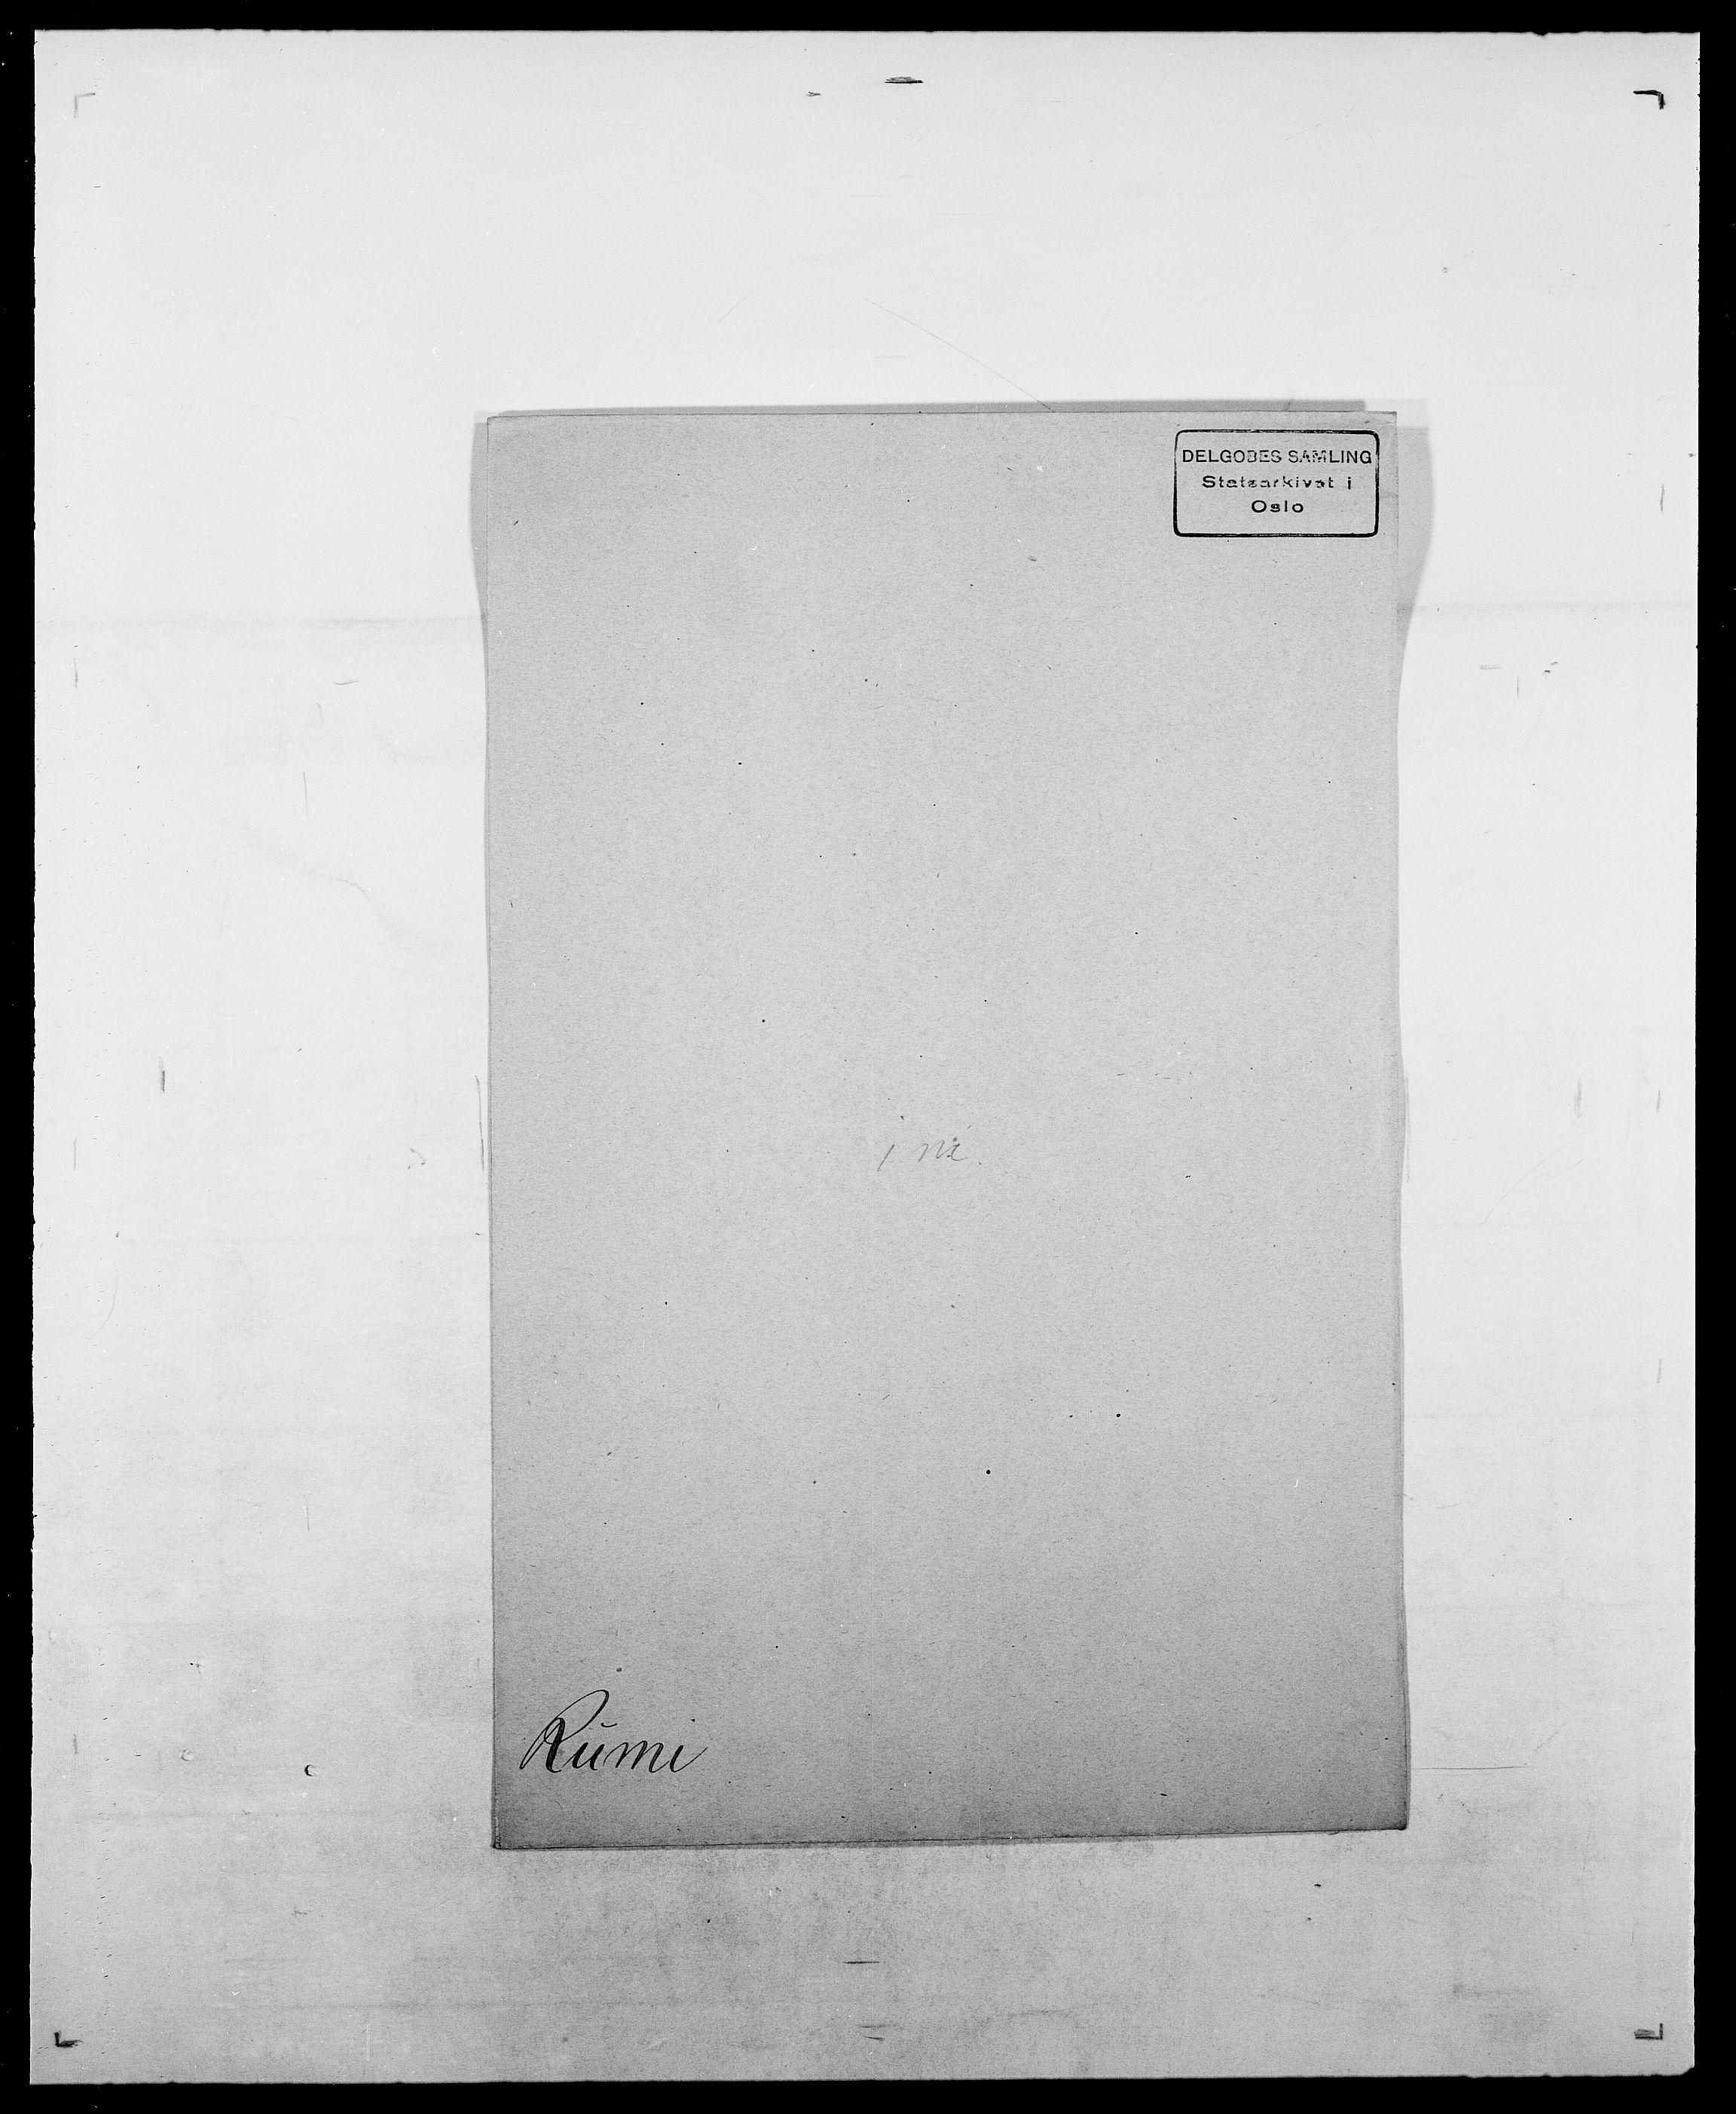 SAO, Delgobe, Charles Antoine - samling, D/Da/L0033: Roald - Røyem, s. 457